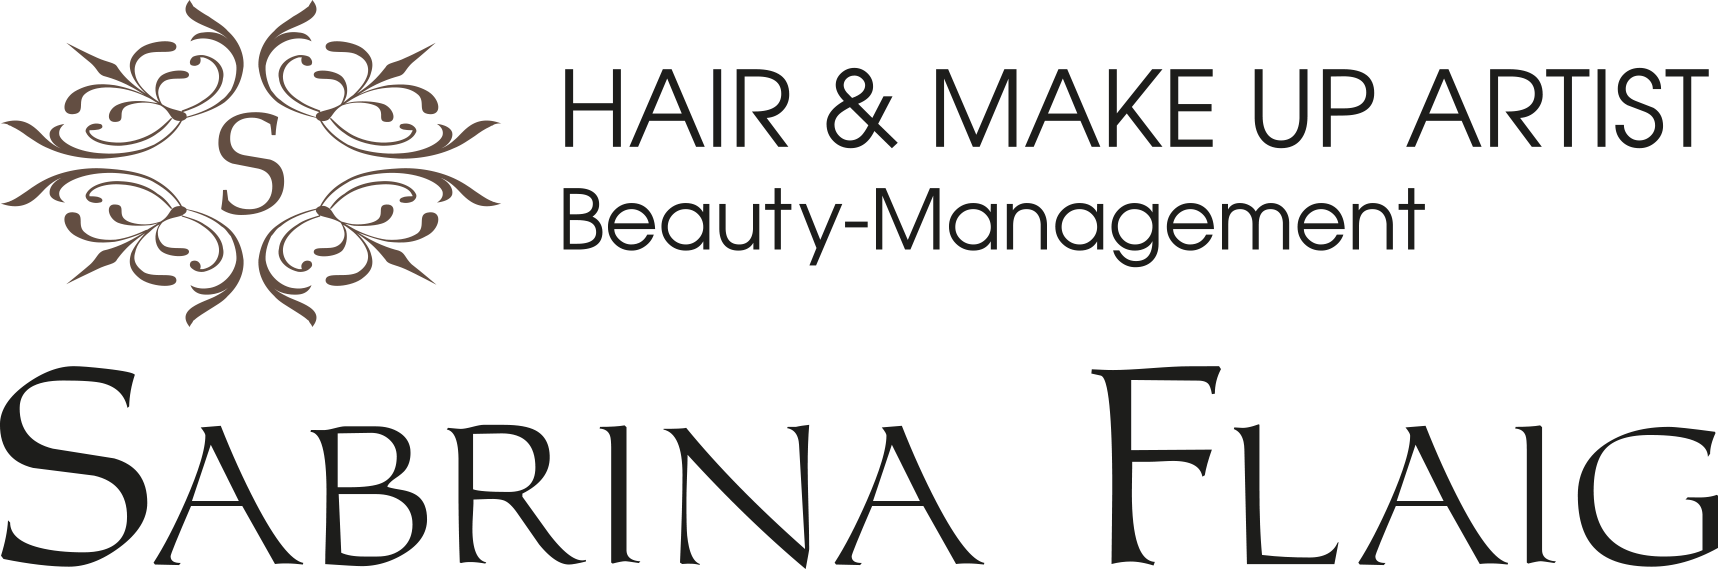 SabrinaFlaig Hair&MakeUp Heilbronn